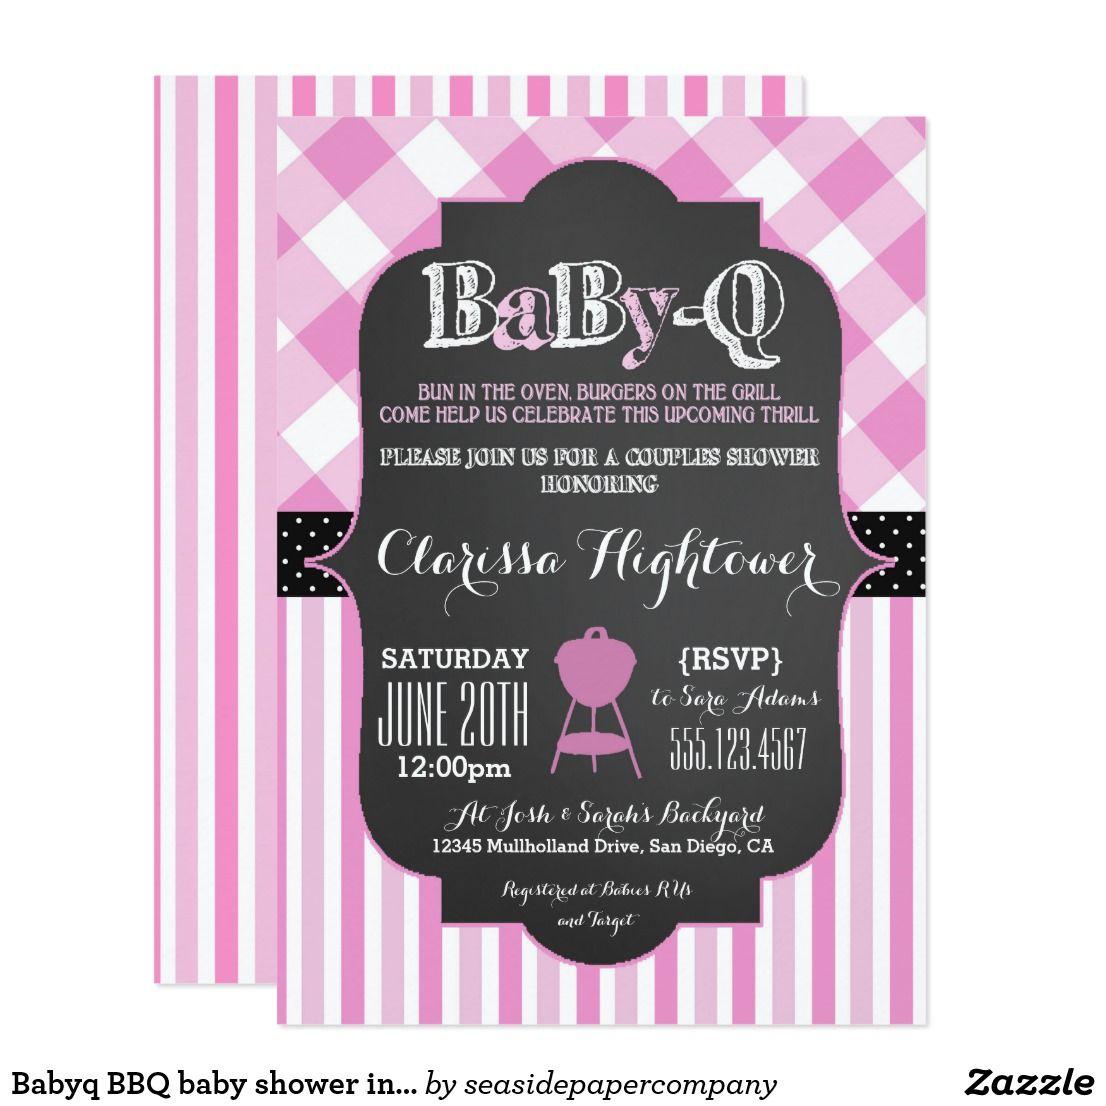 Babyq BBQ baby shower invitation couples girl